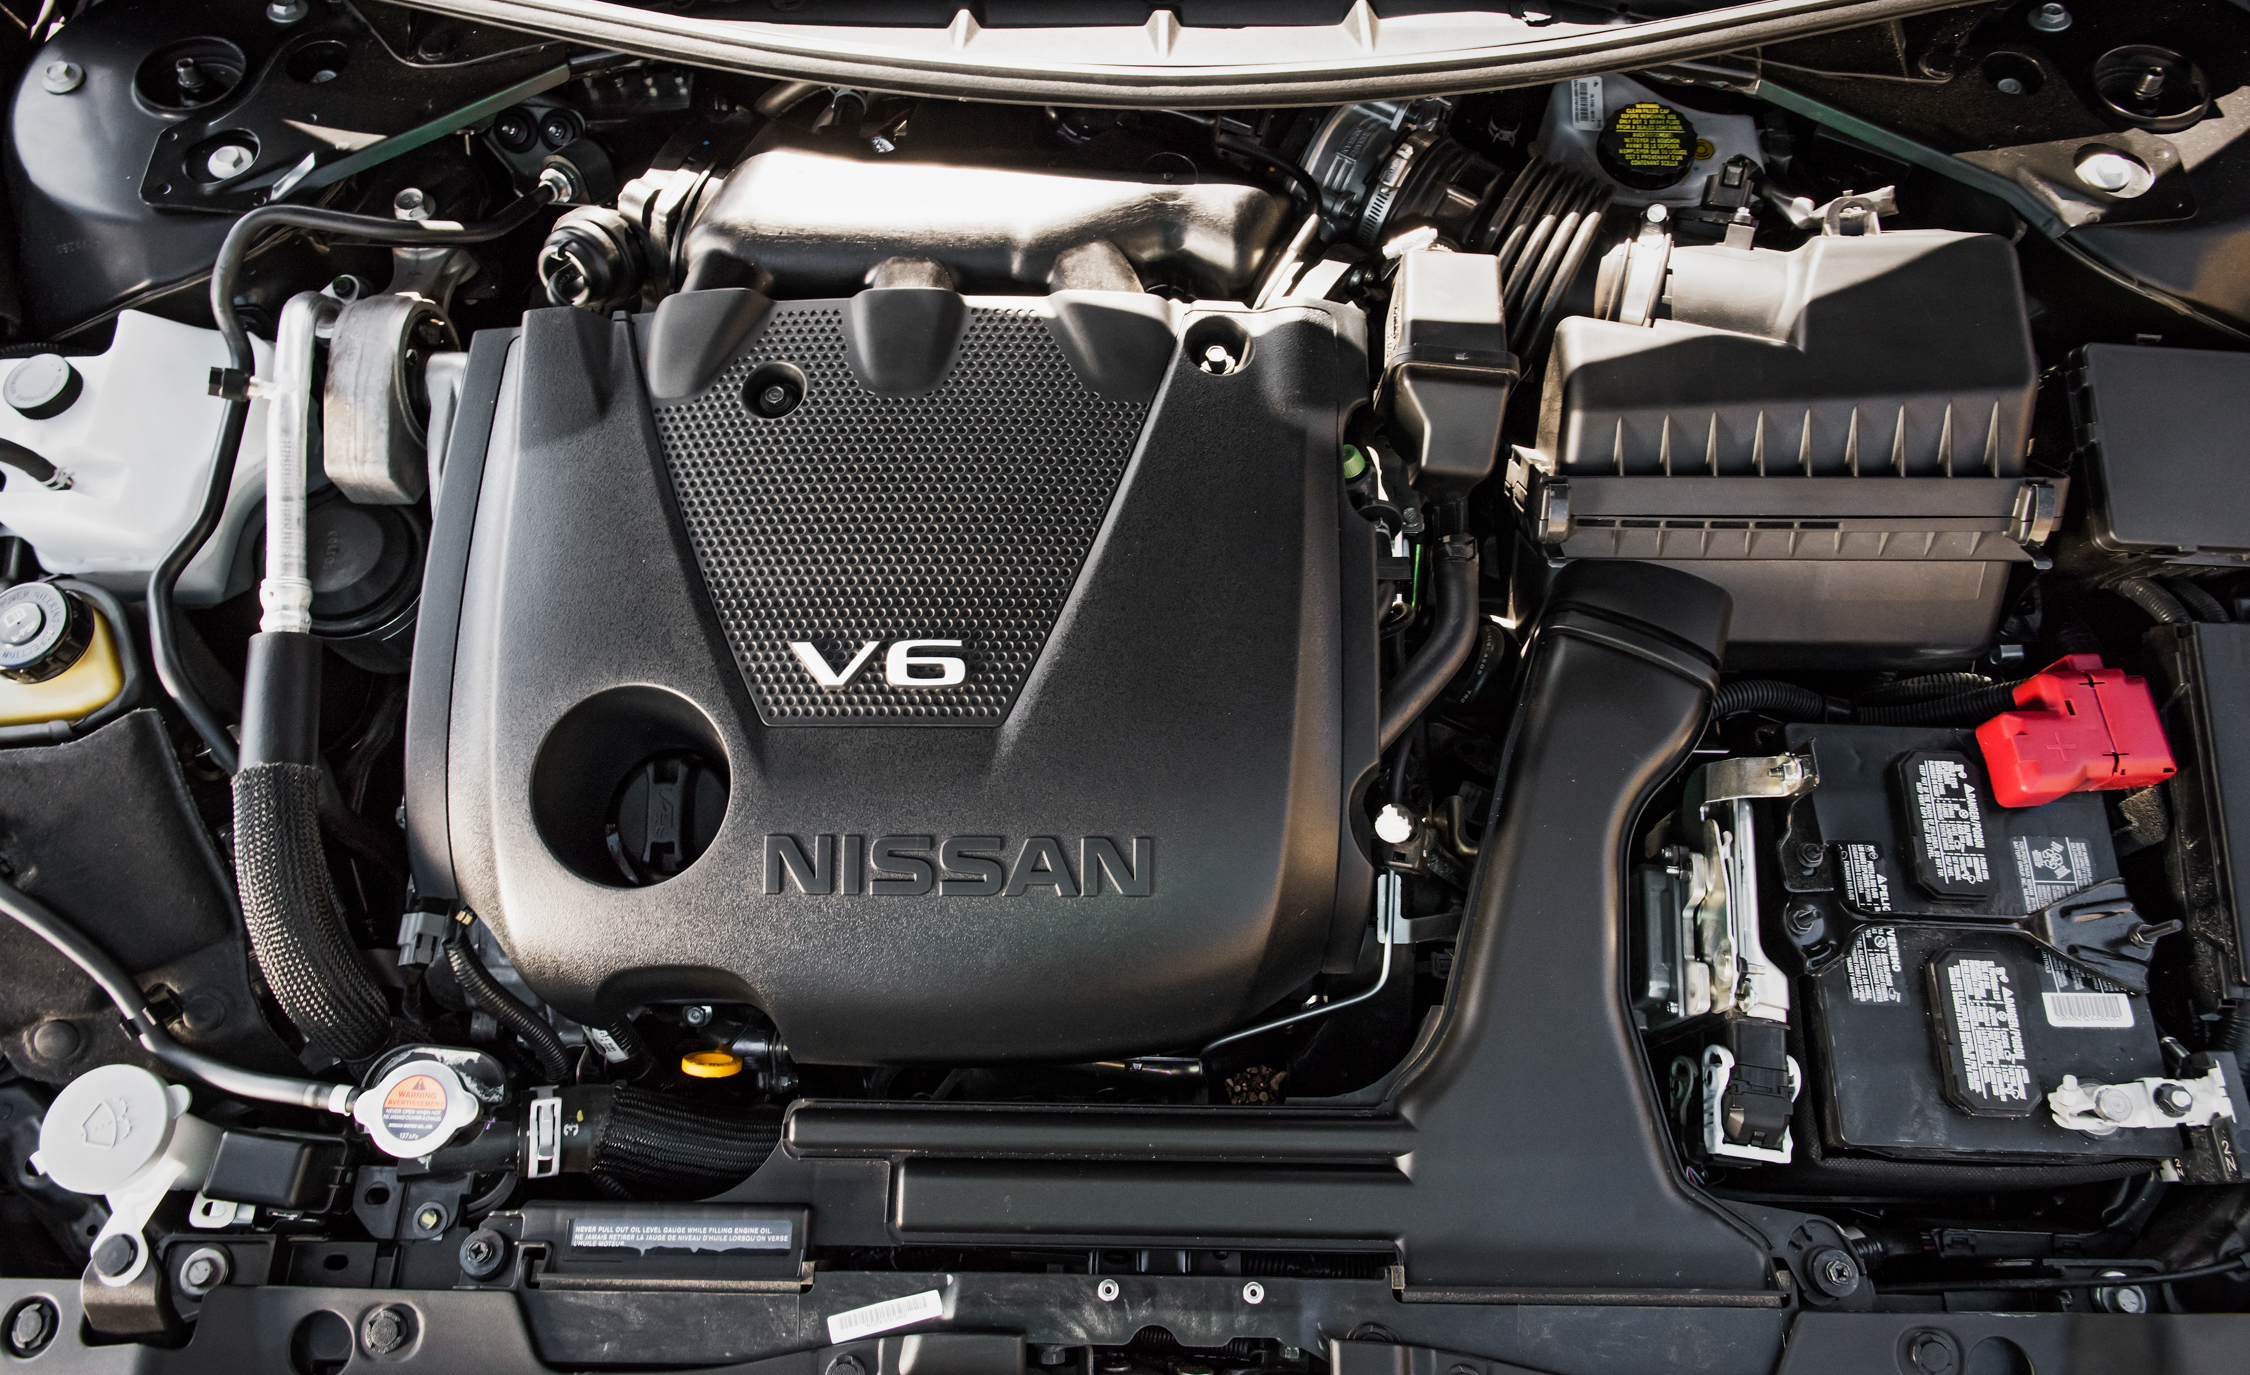 2016 Nissan Maxima SR 3.5-Liter V-6 Engine